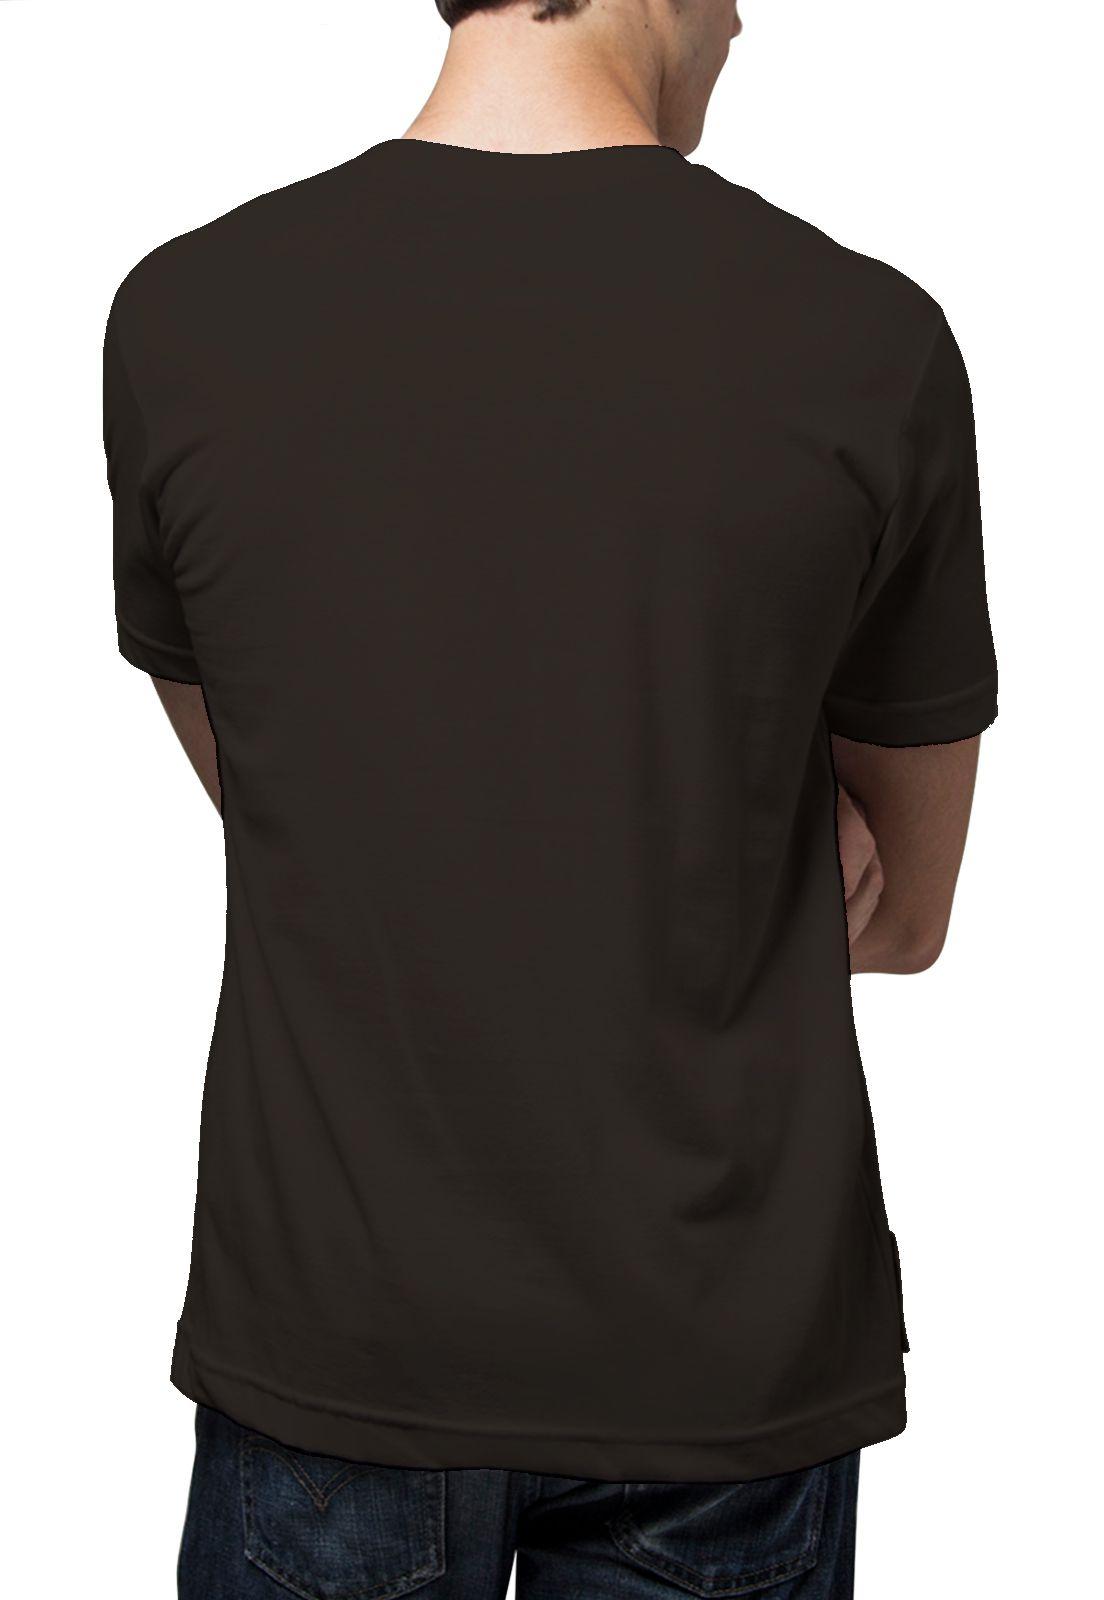 Camiseta Amazônia Lobo - Cinza